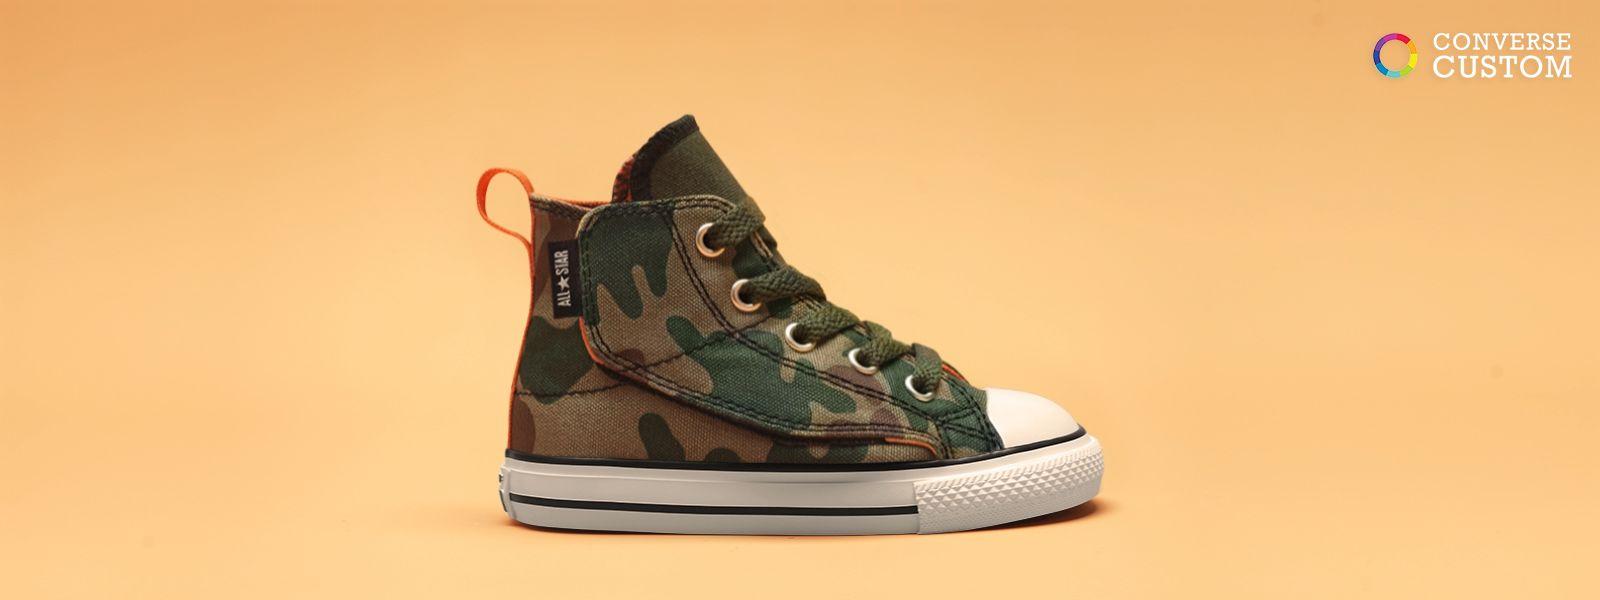 Converse clipart kid shoe Com Boys' CONS Converse Shoes